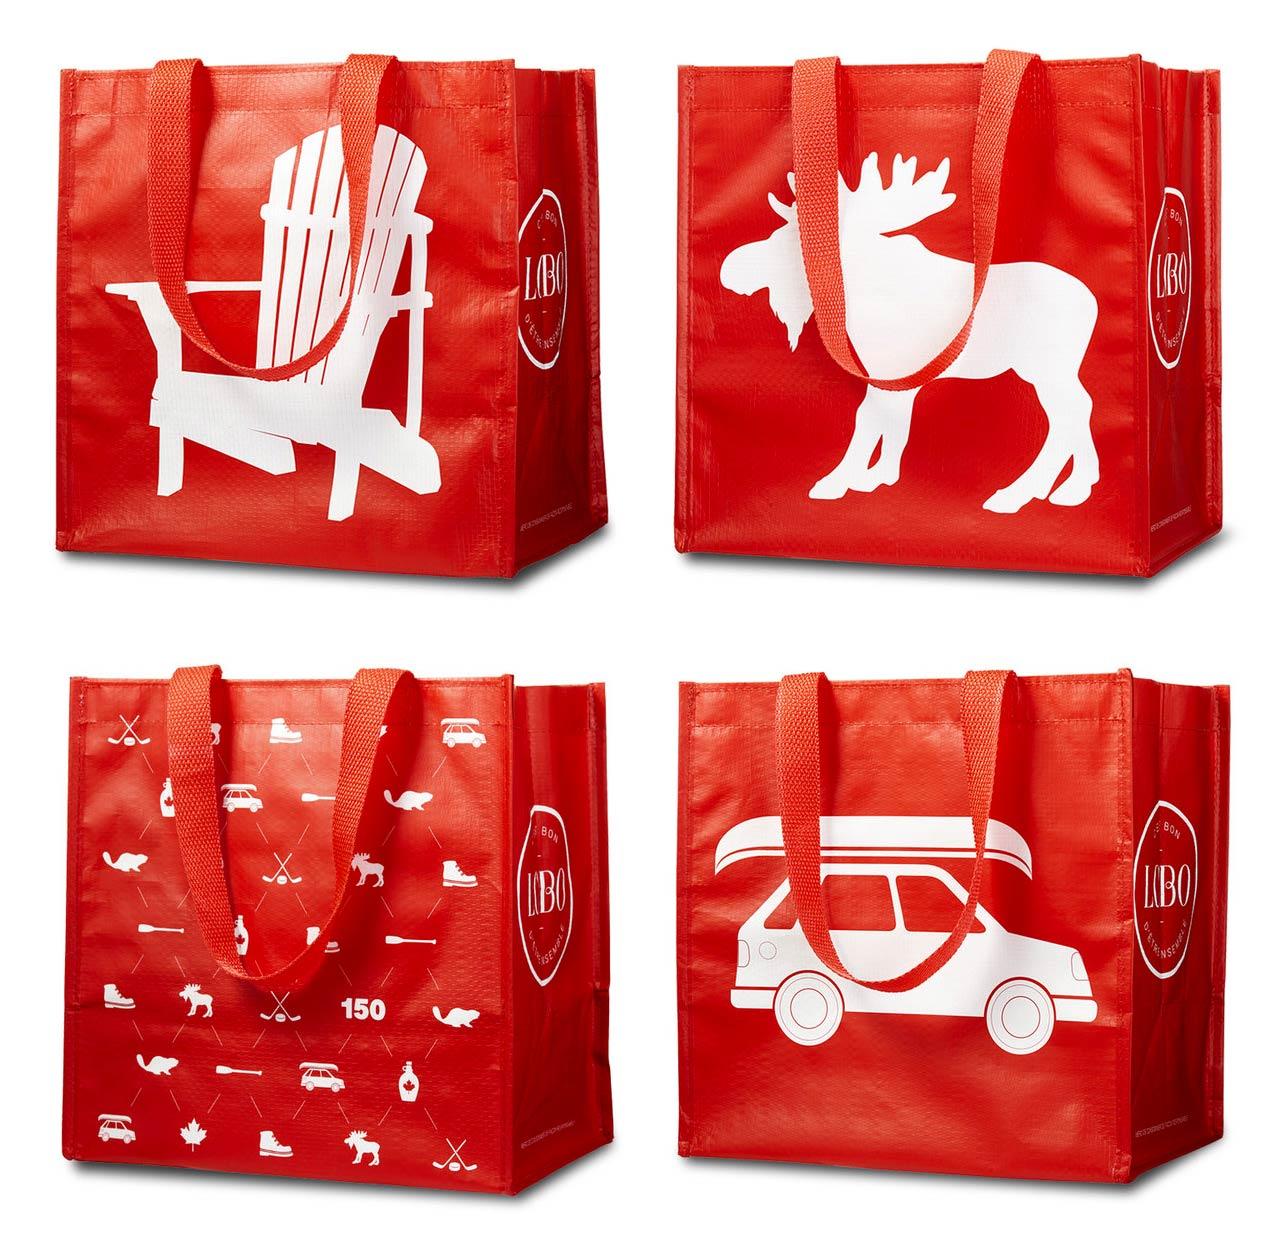 Copy of Enviro bags